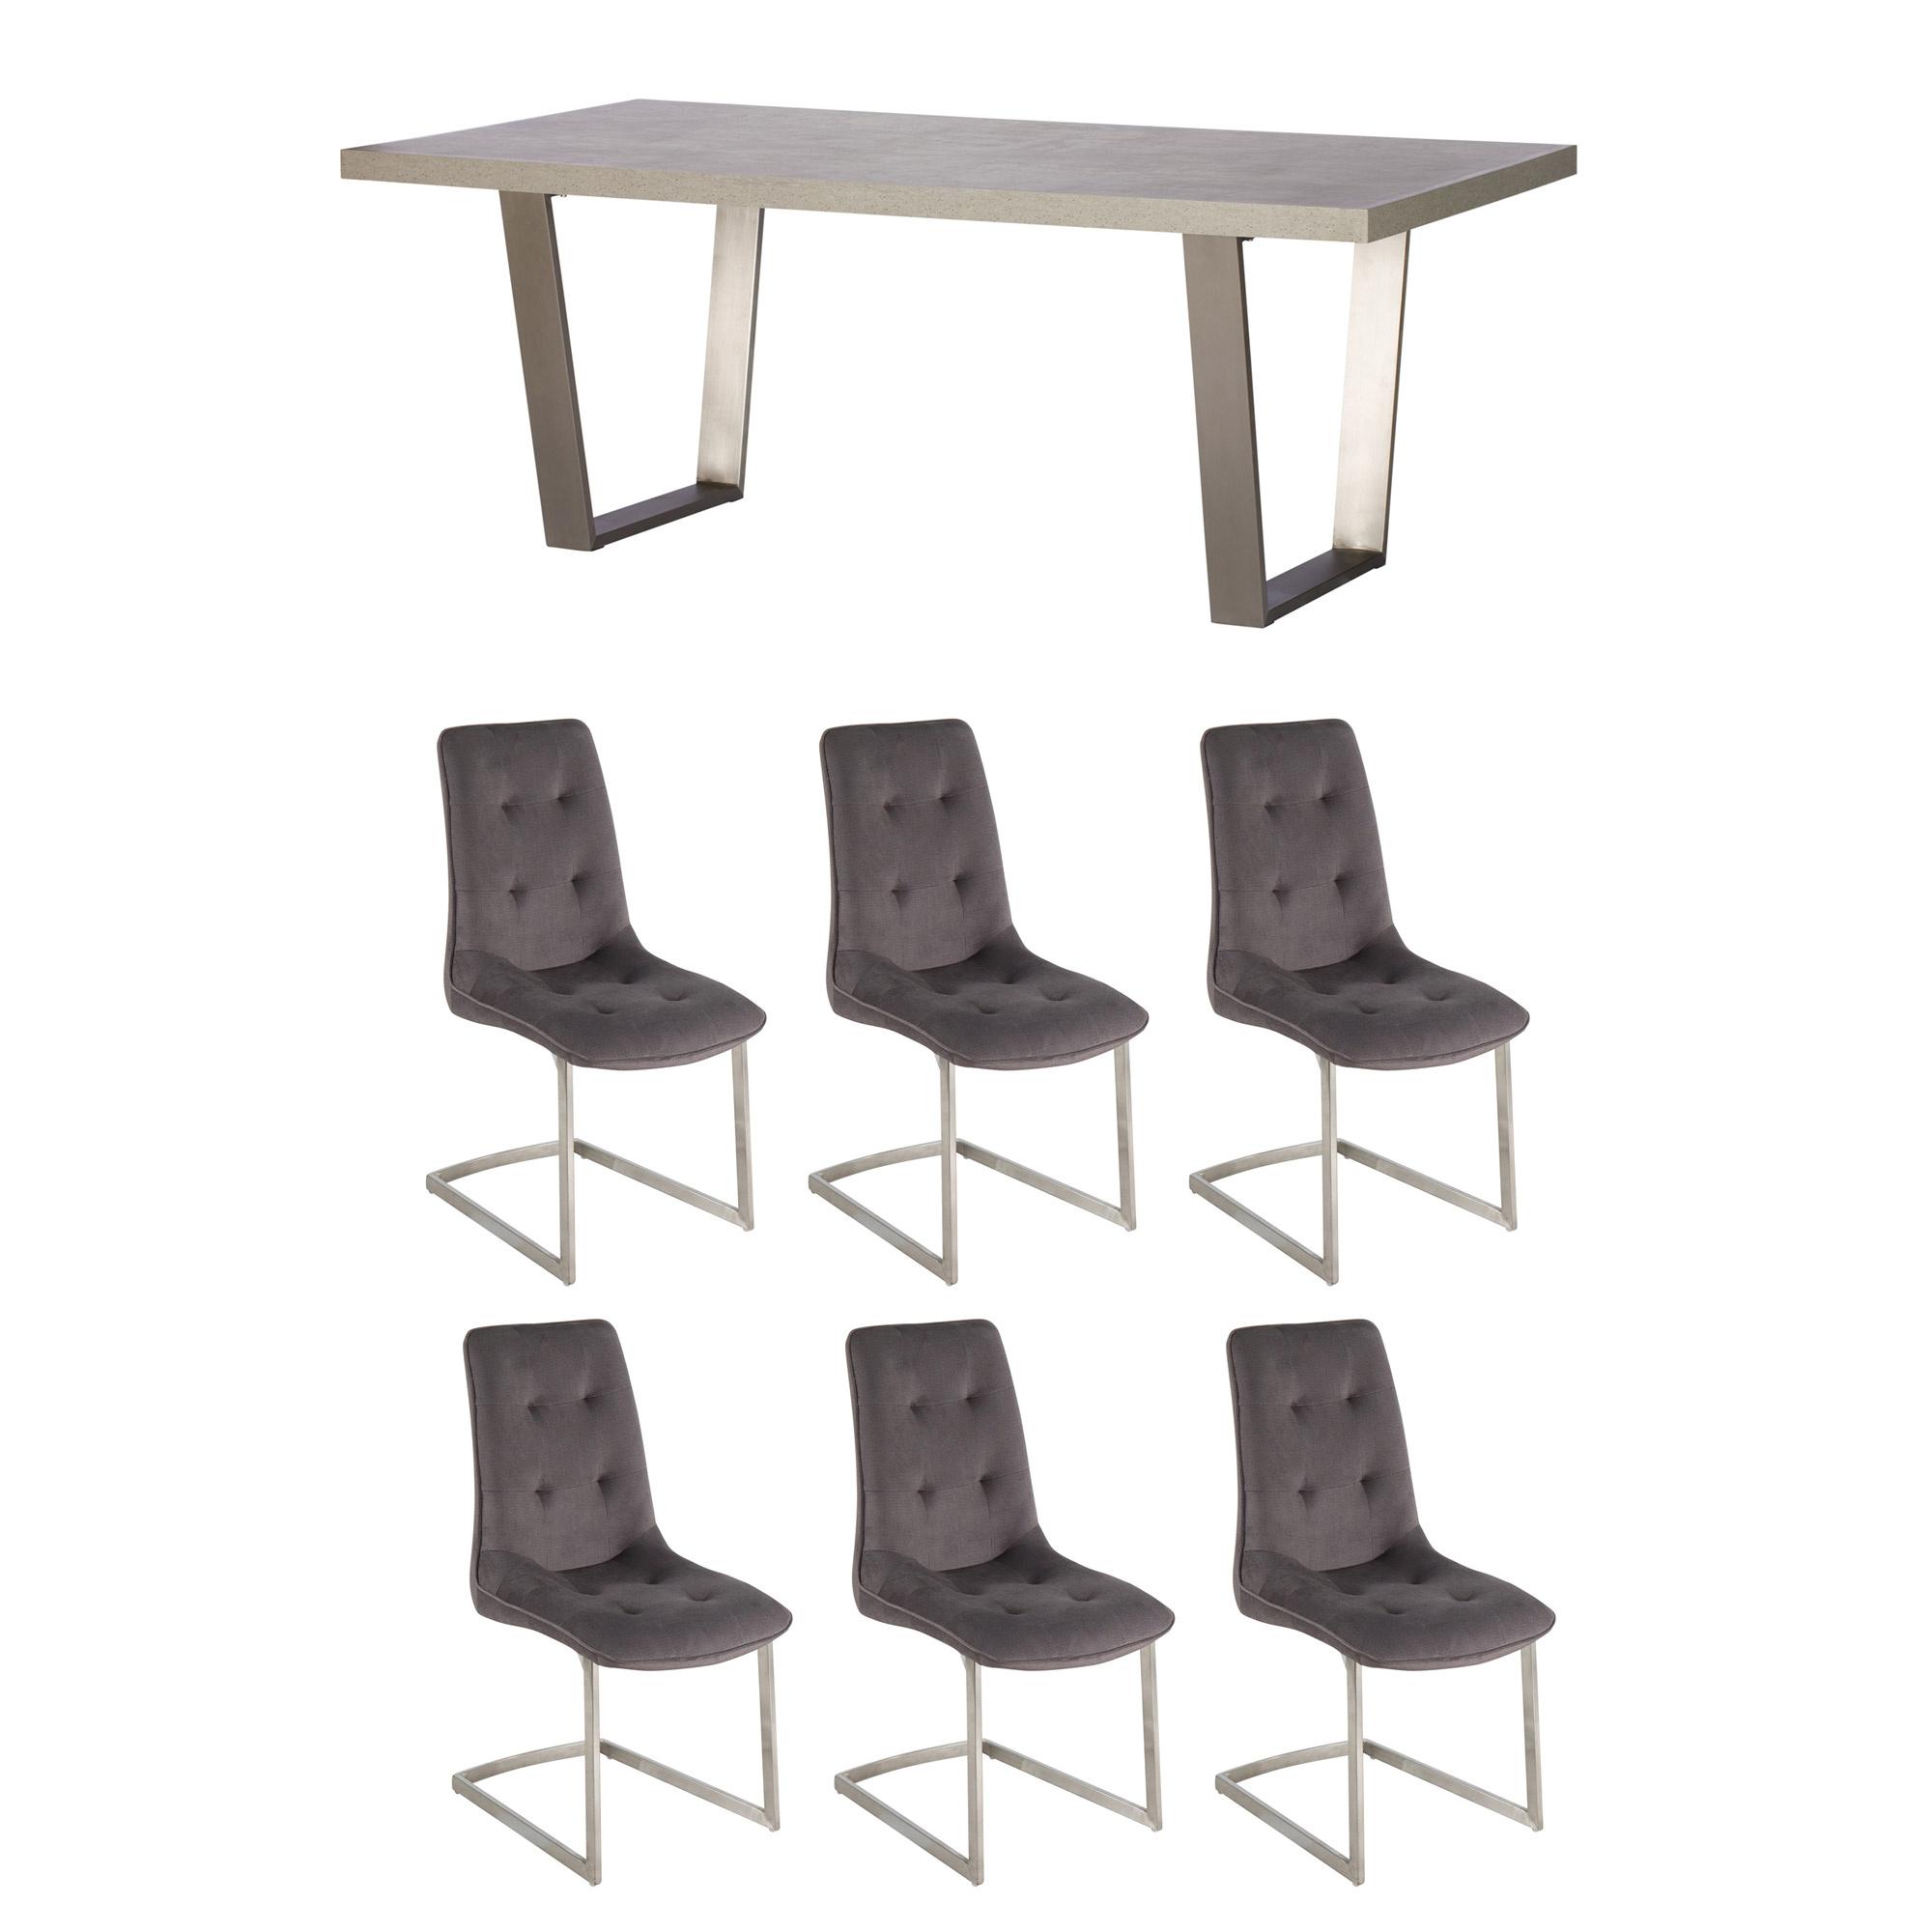 Caspian 200cm Dining Table 6 Avanti Grey Chairs